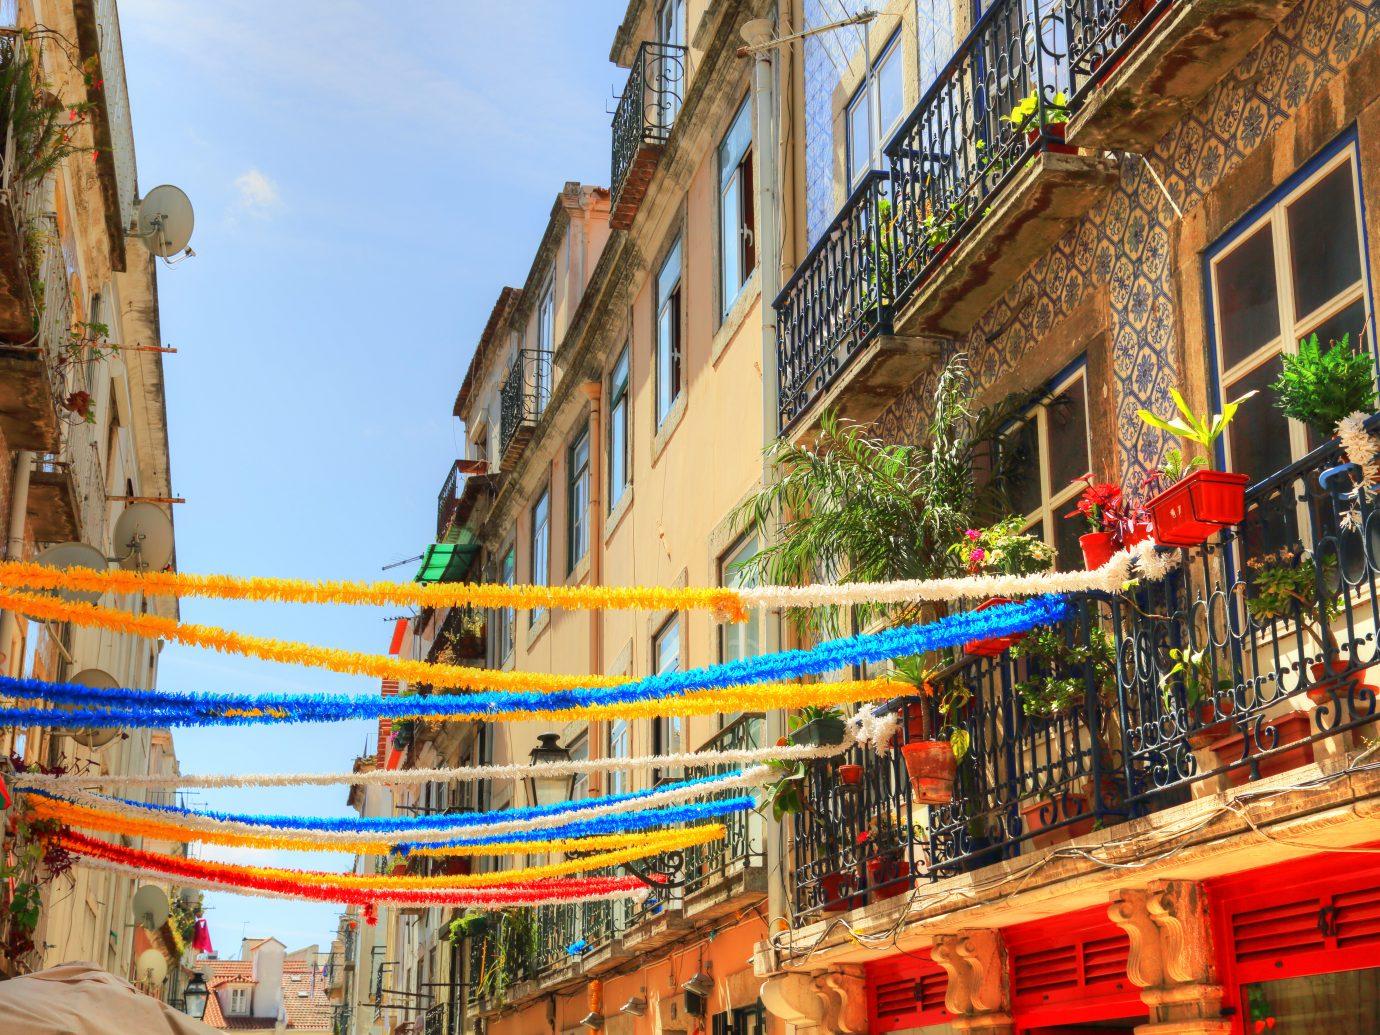 LISBON, PORTUGAL-OCTOBER 2017: Trendy bistro in historic part of Lisbon